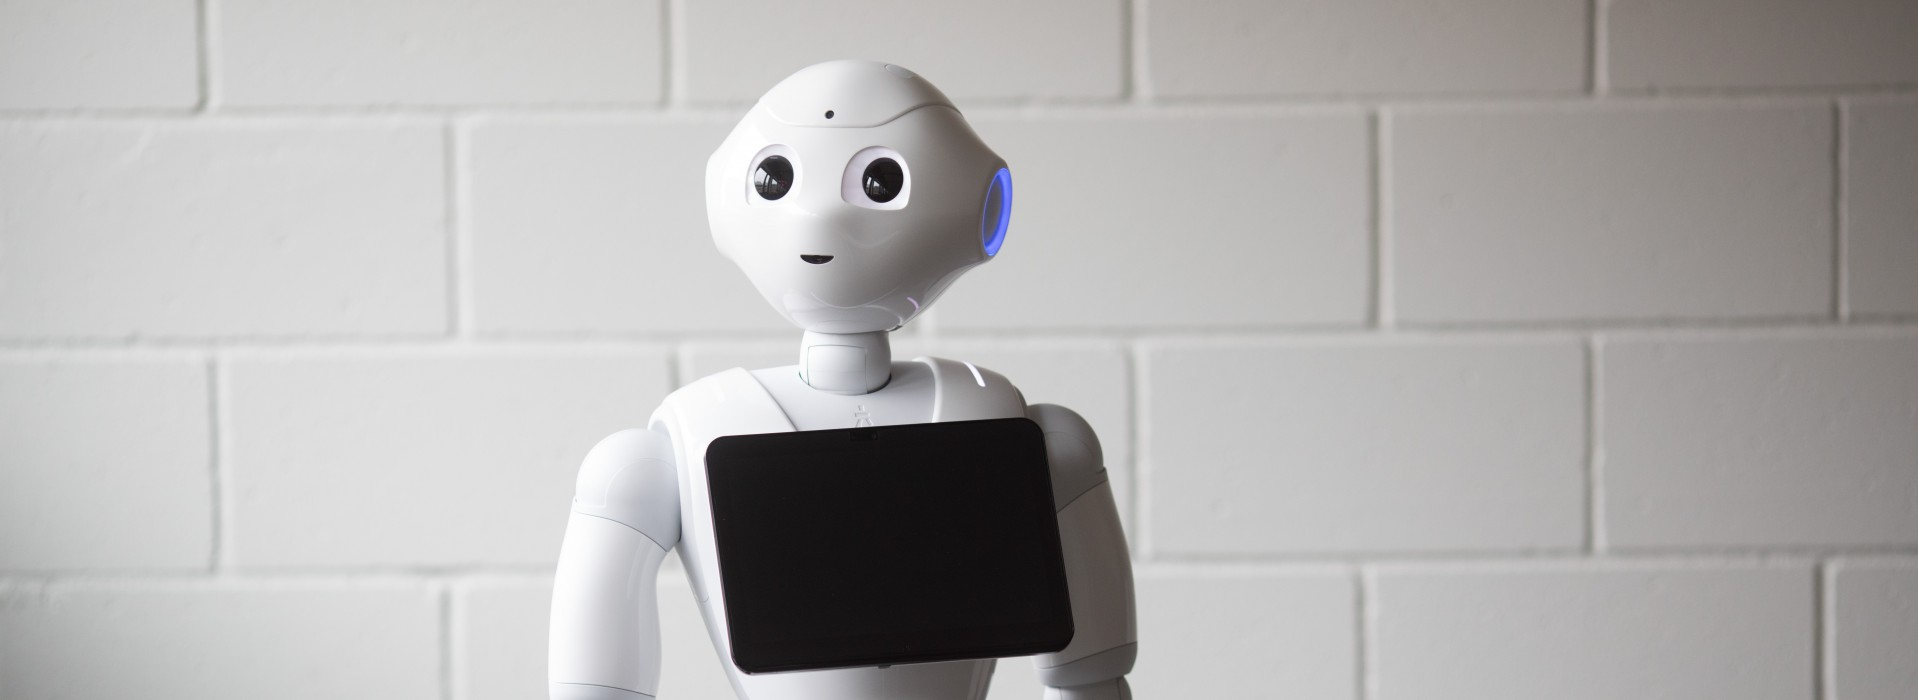 Pepper_Humanoid Robot by Hansab